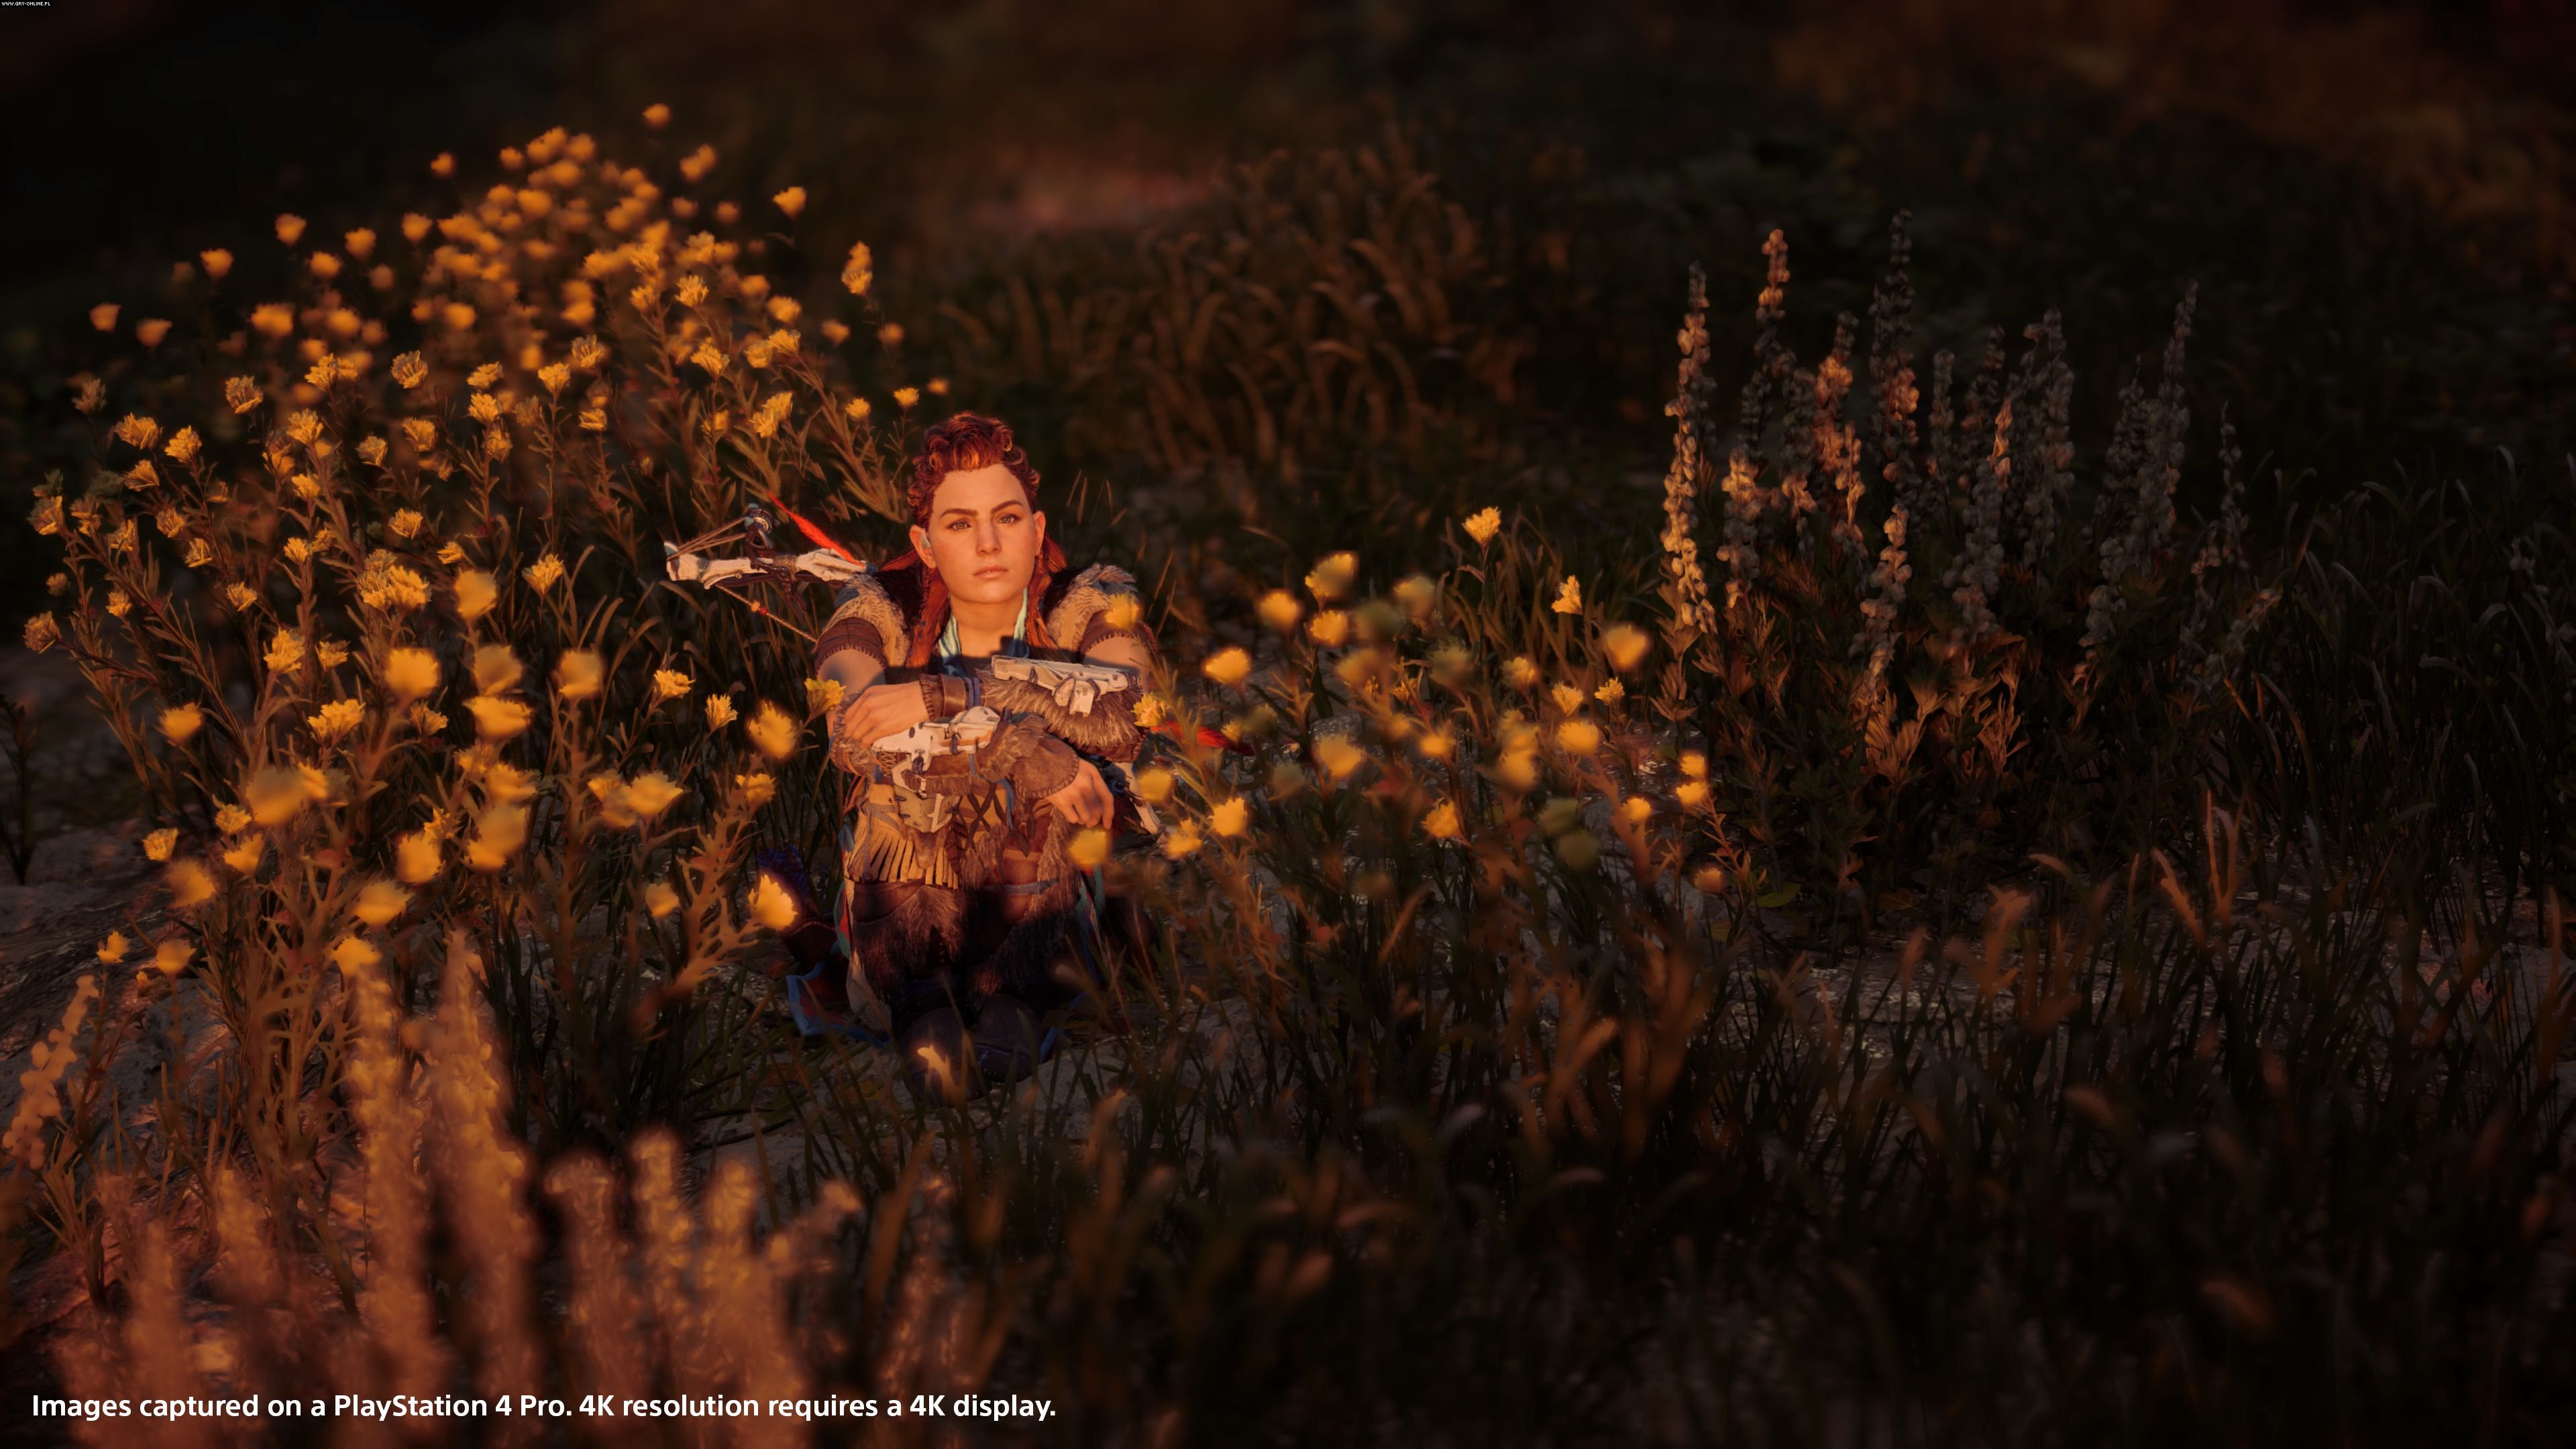 Horizon Zero Dawn PS4 Games Image 2/57, Guerrilla Games, Sony Interactive Entertainment